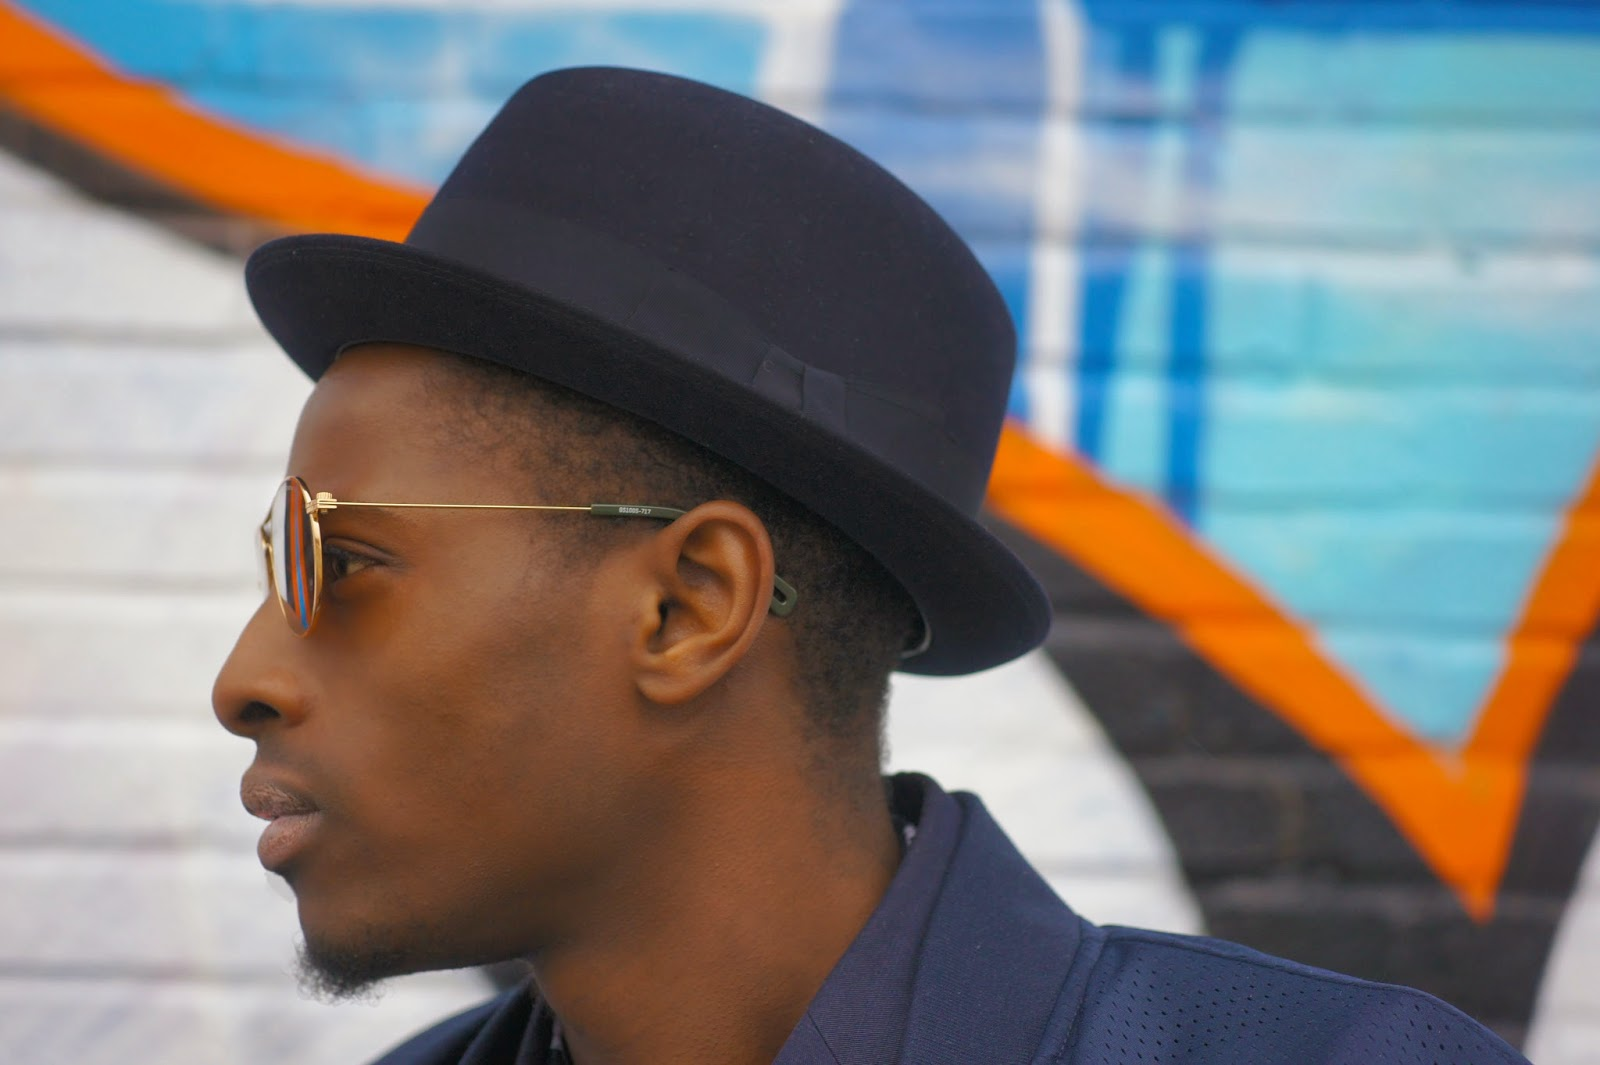 Dapper Hot Boy with gold G-STAR RAW sunglasses HAT